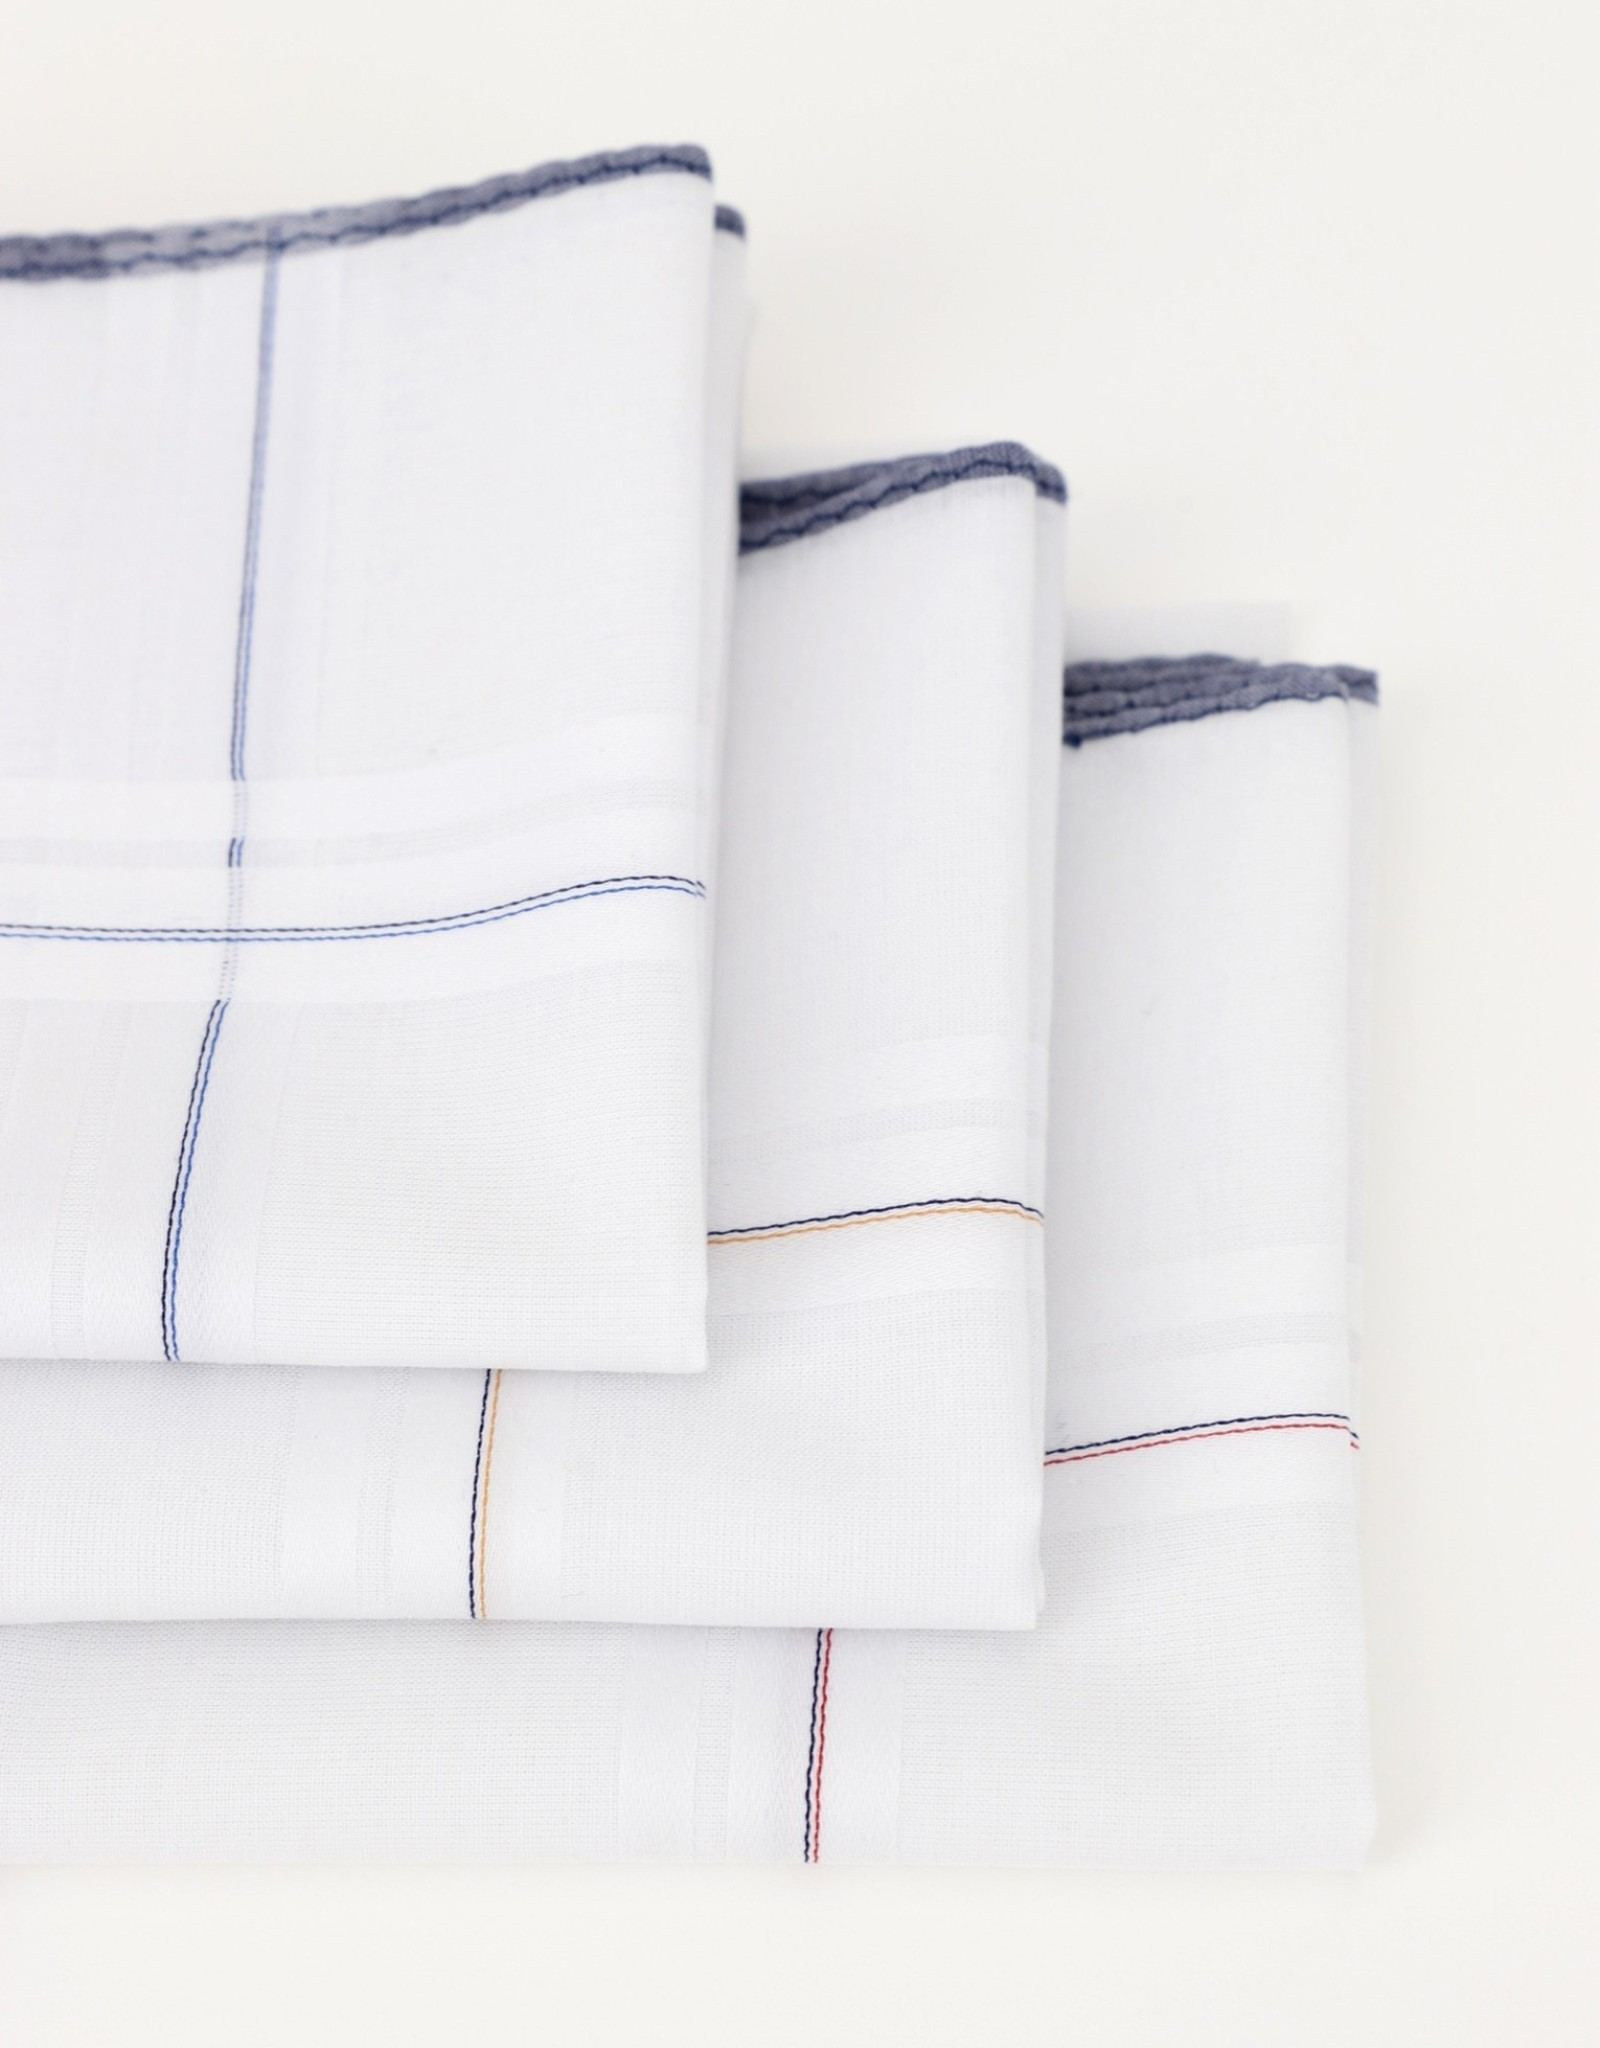 Perofil Perofil zakdoeken wit met blauwe rand 3 paar Fazzoletti